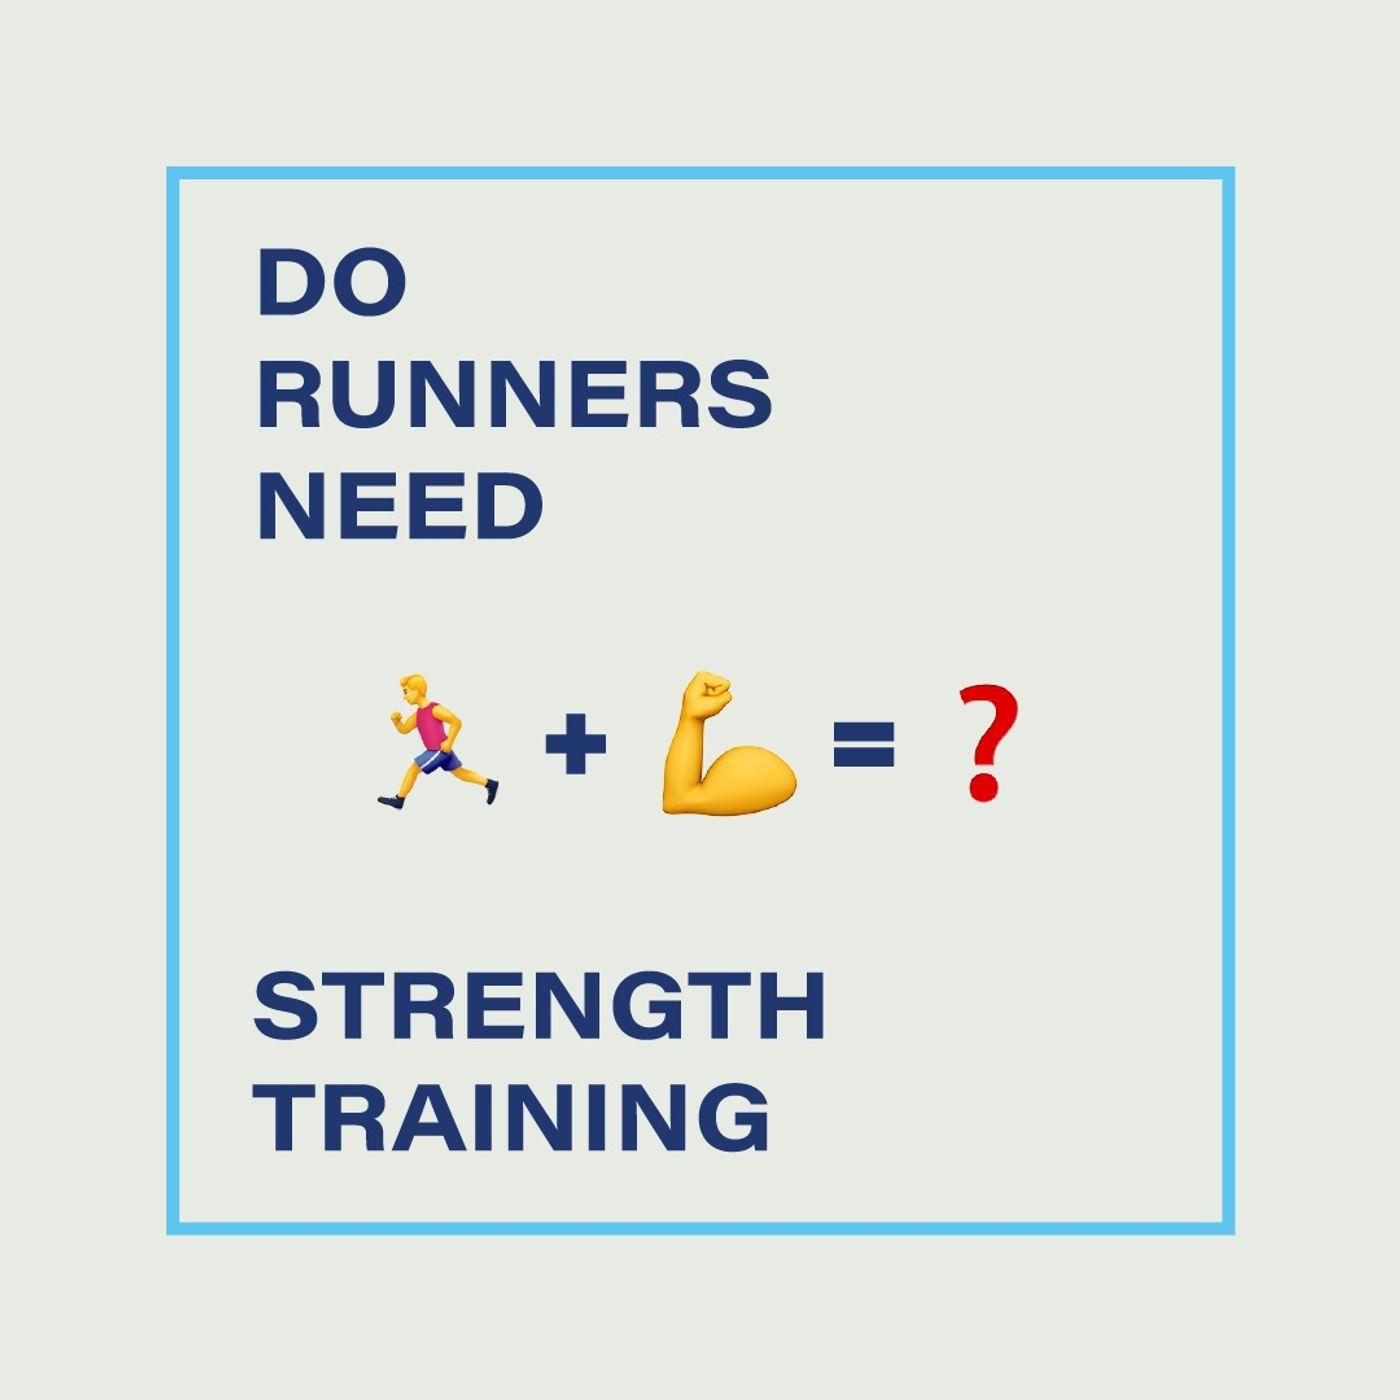 R3-25 Do Runners Need To Strength Train?